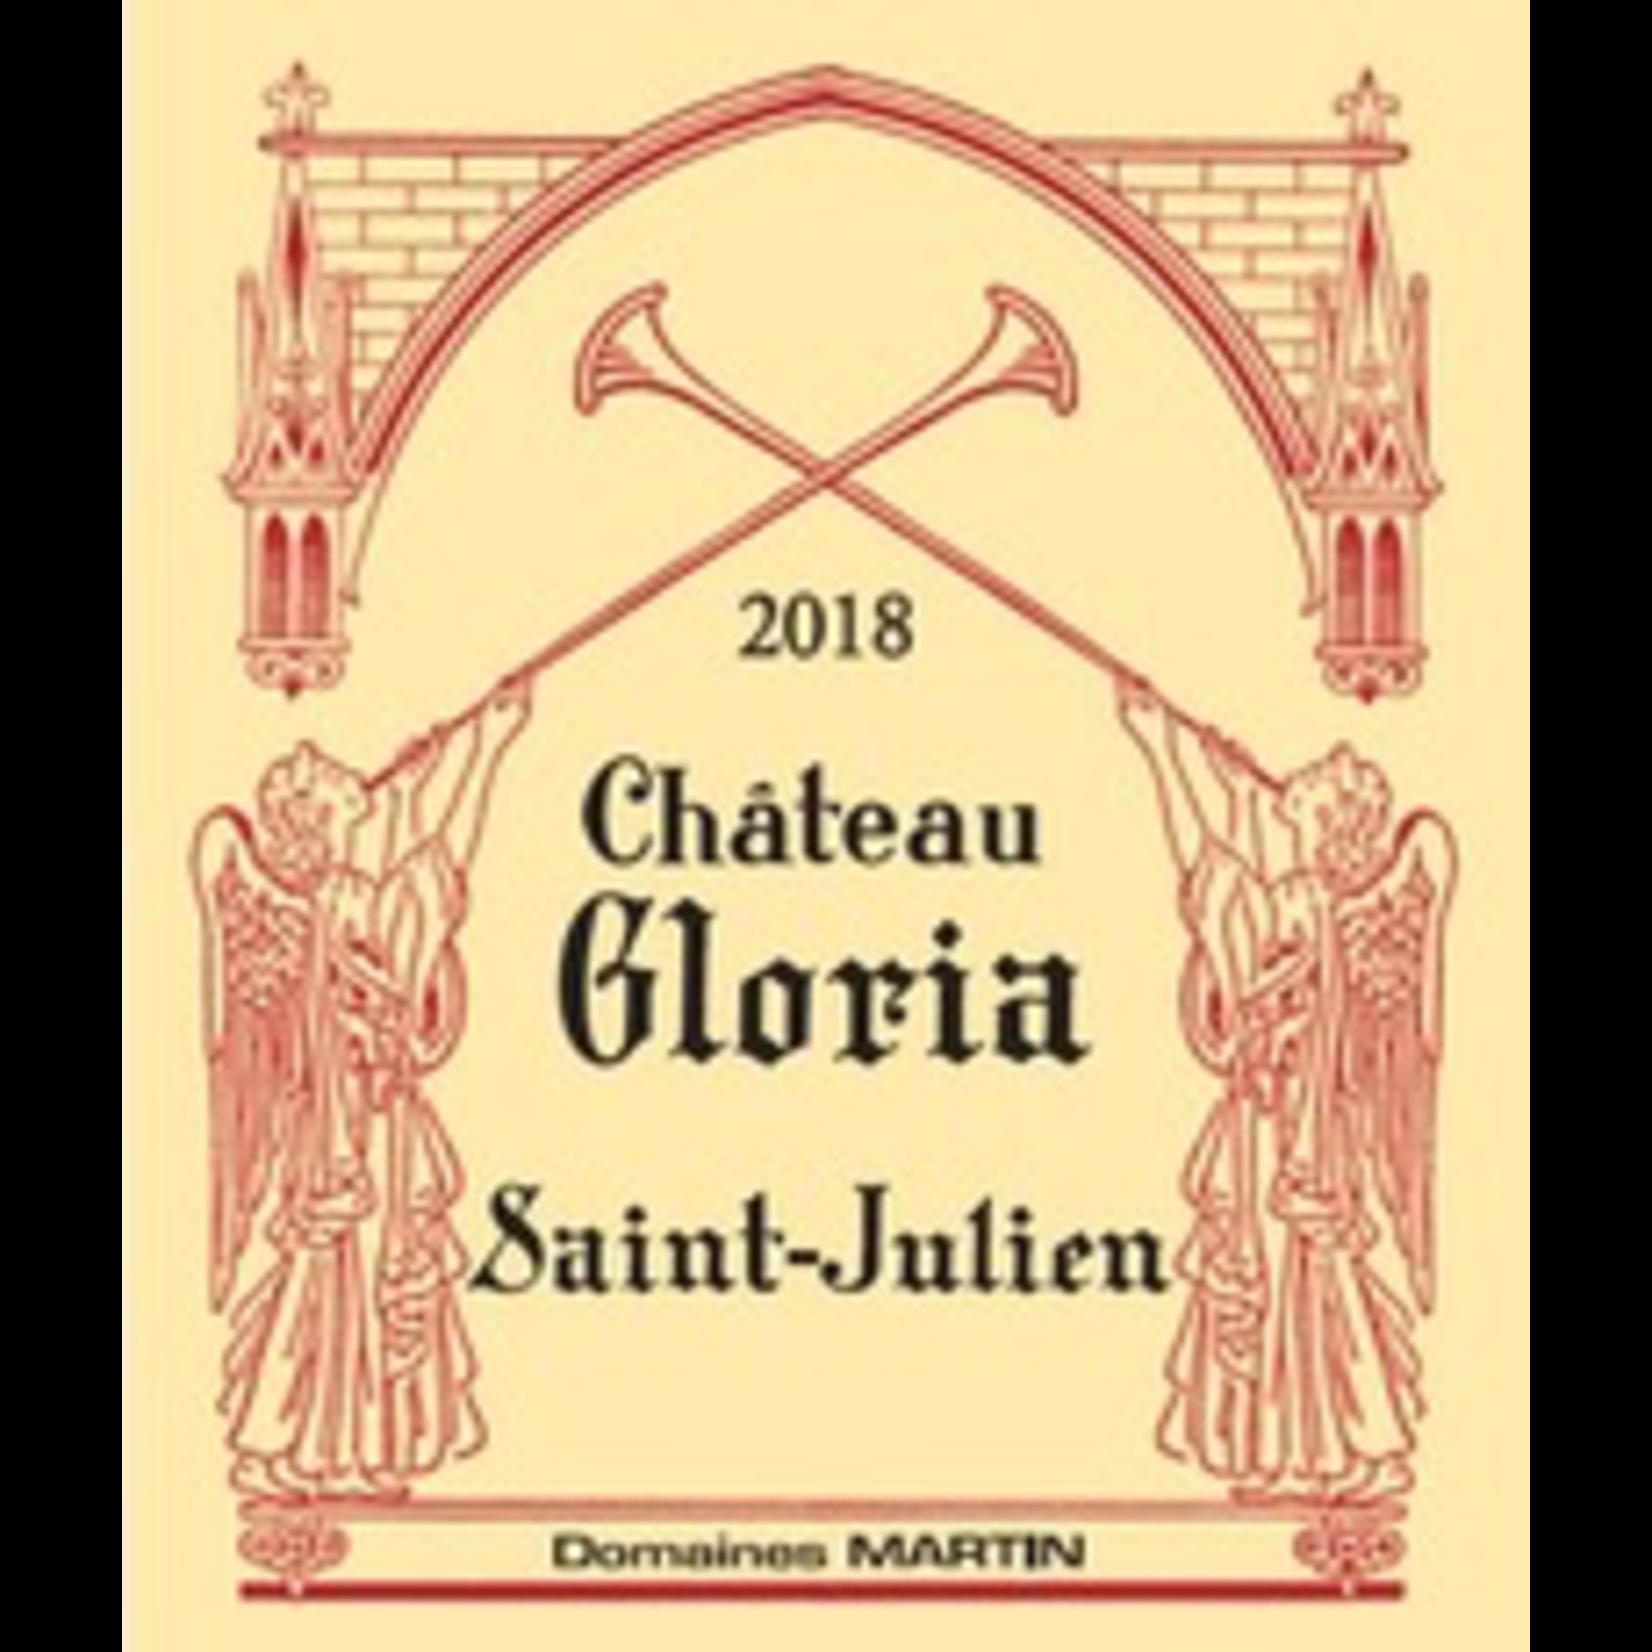 Wine Chateau Gloria Saint Julien 2018